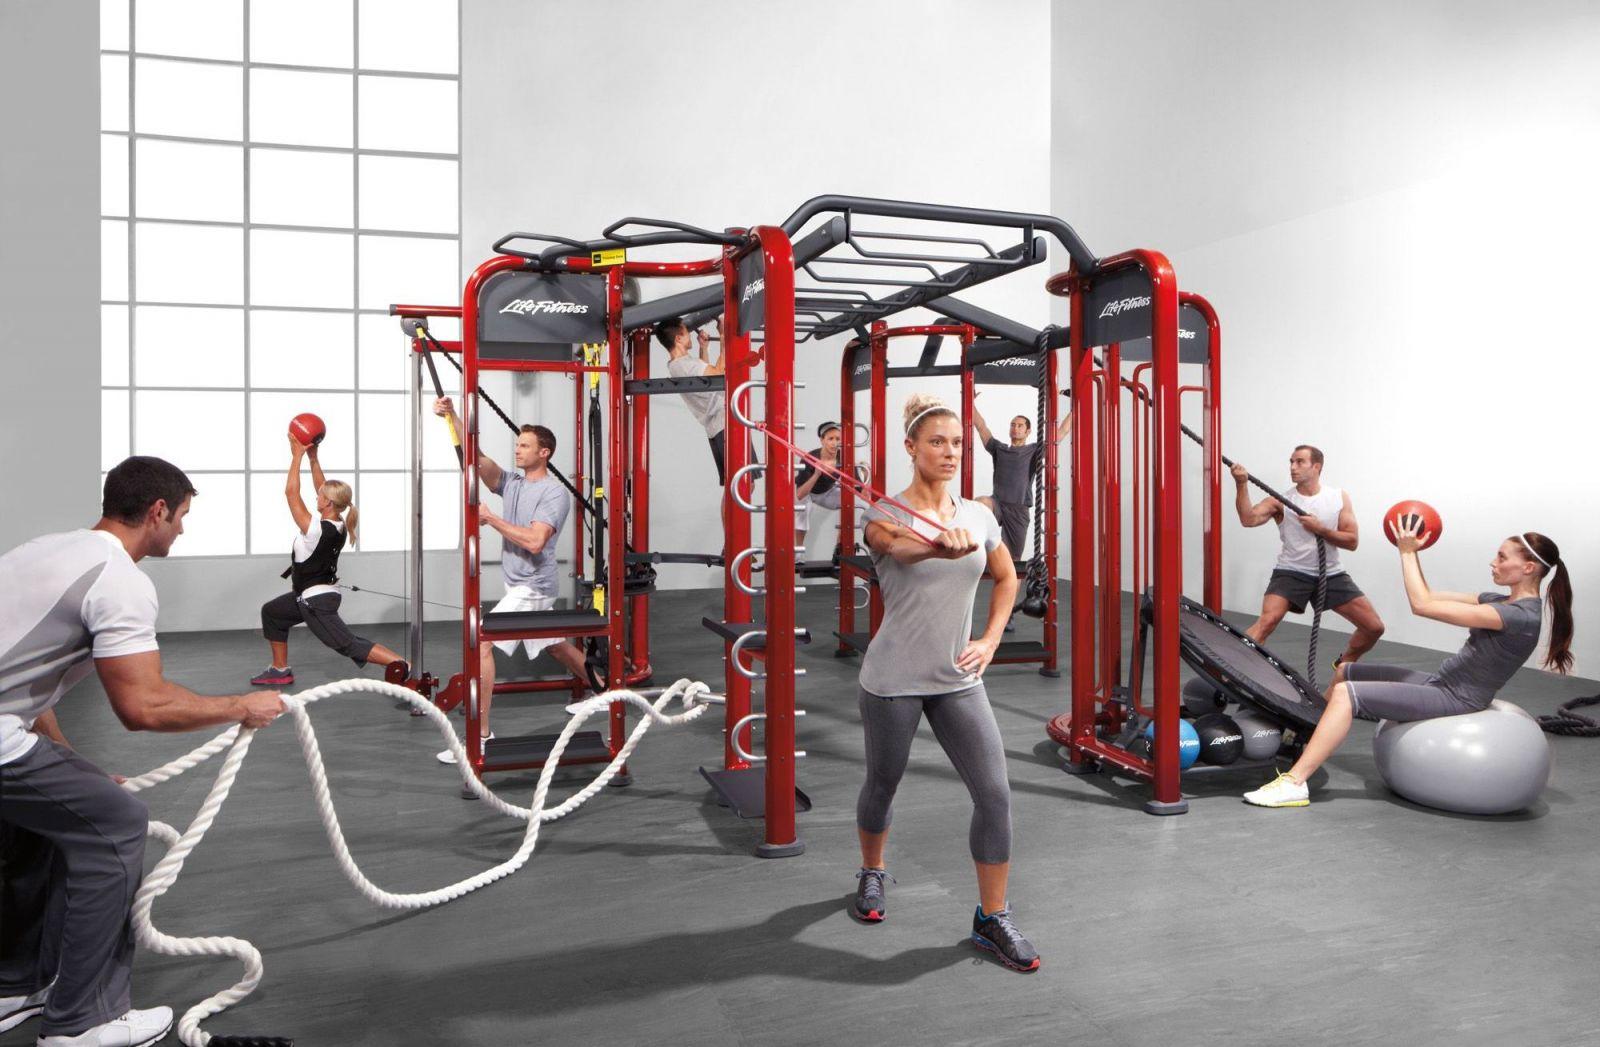 https://way4you.com.ua/images/upload/way4you_functional_gym.jpg